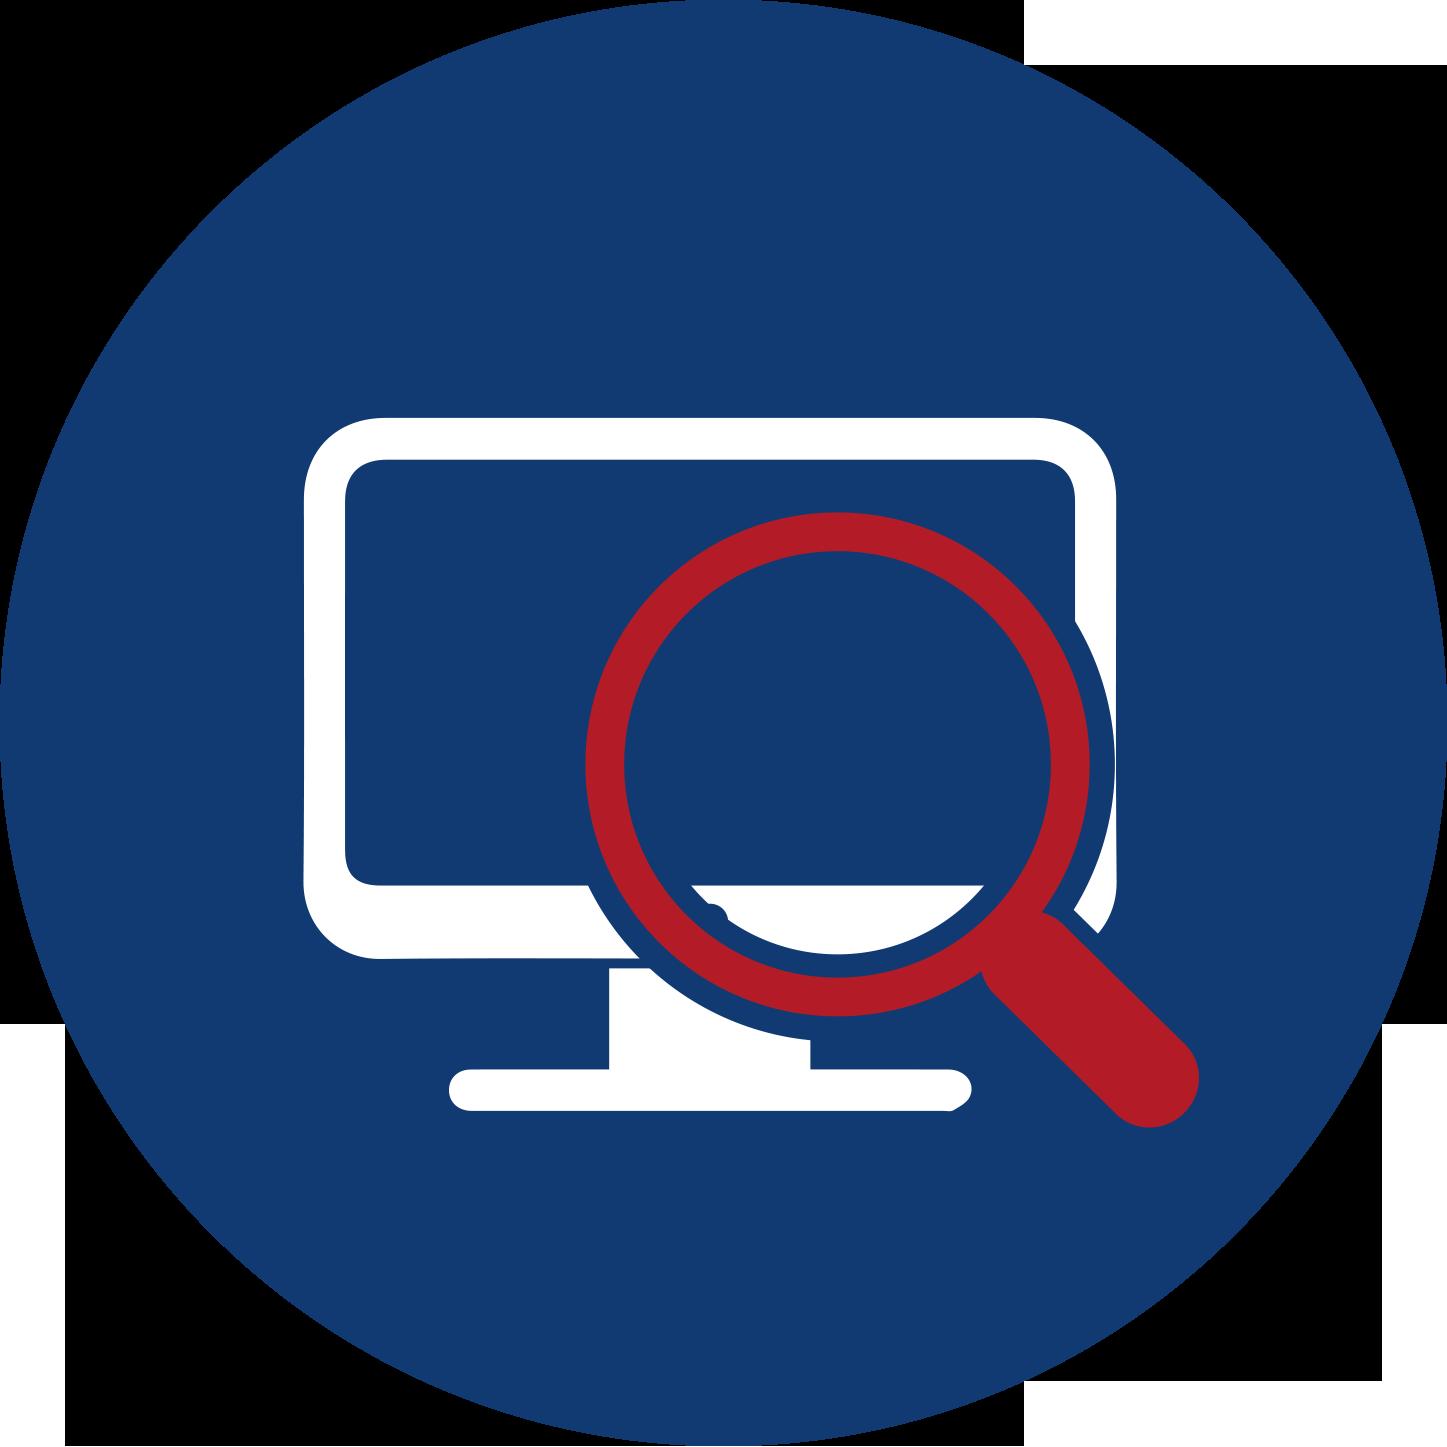 IBP-quickscan en audits